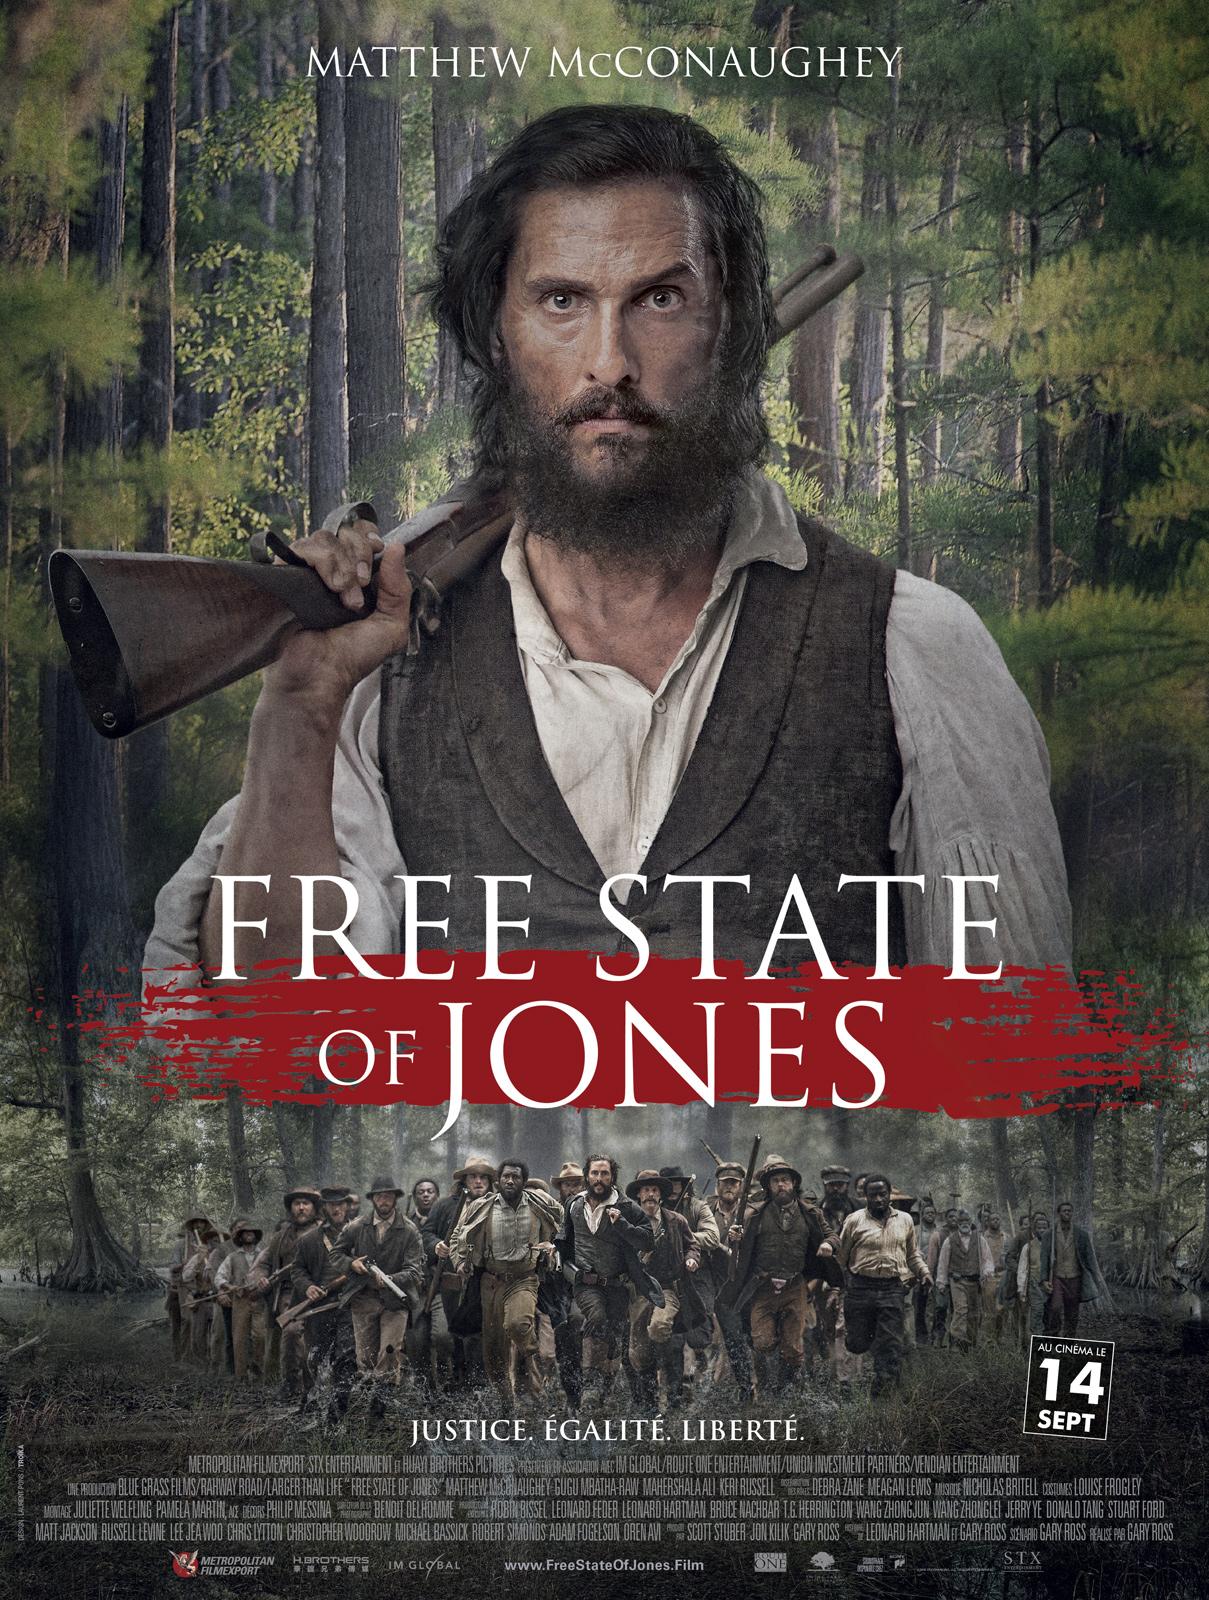 Télécharger Free State Of Jones Complet DVDRIP Uptobox